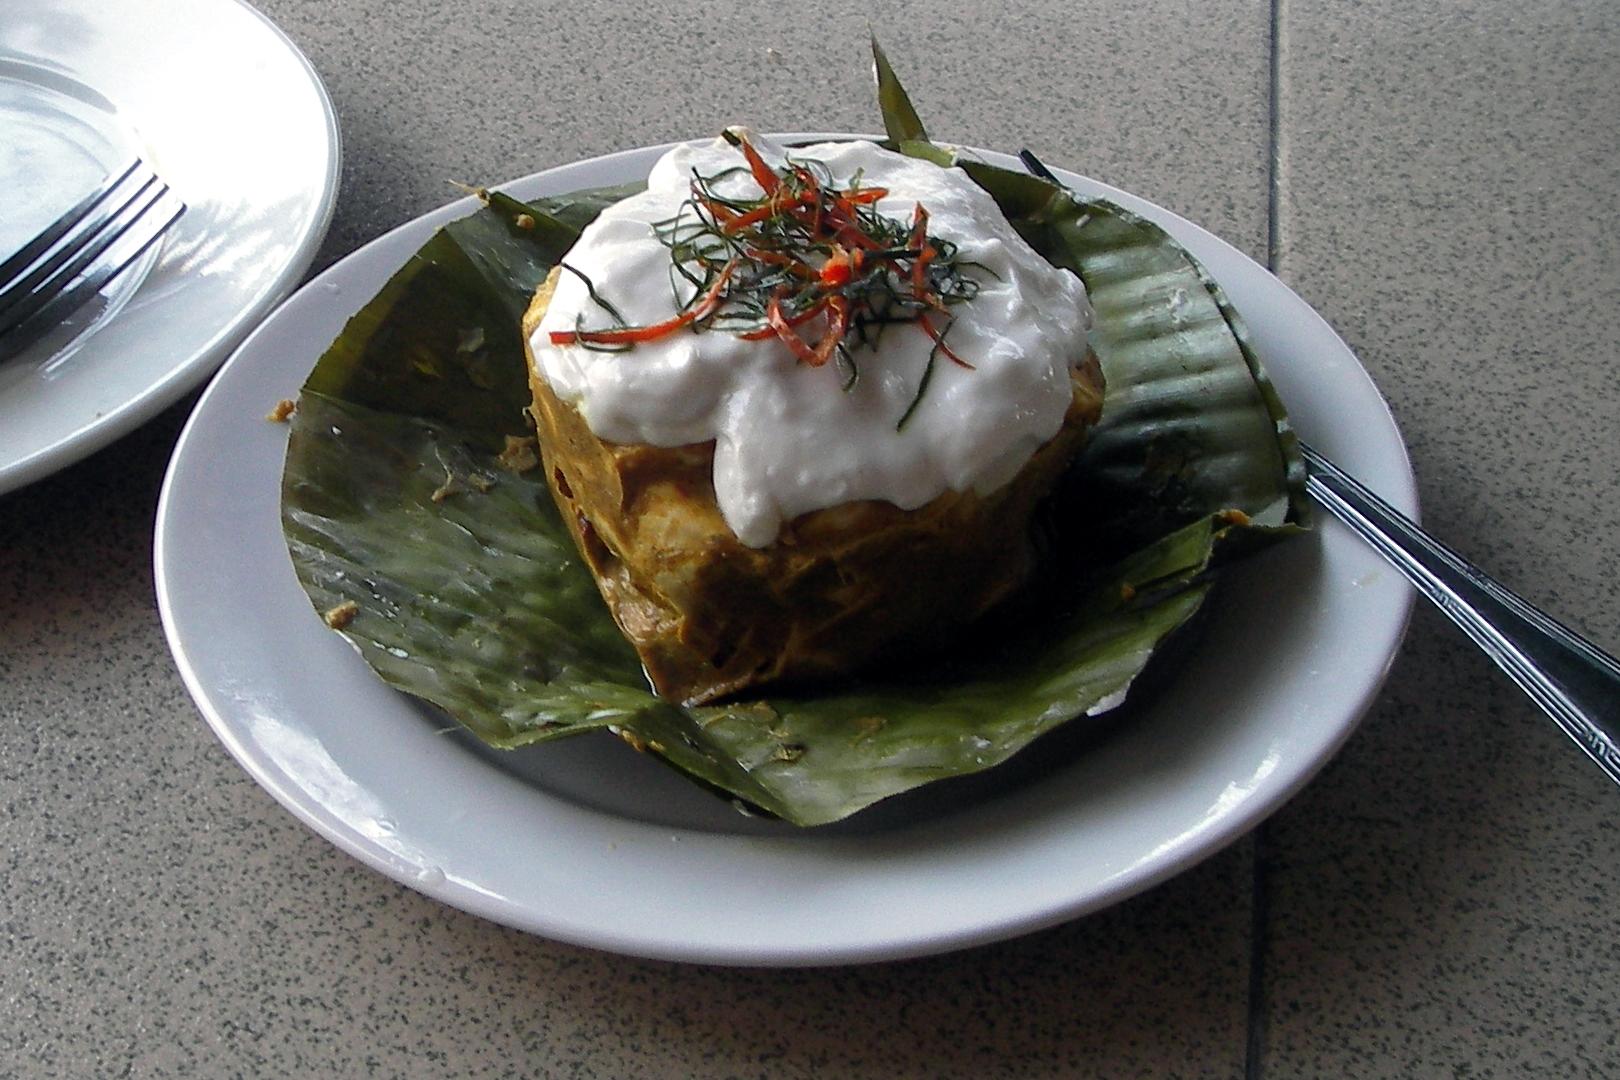 Cambodian cuisine vanndeth53010410161 for A taste of cambodian cuisine